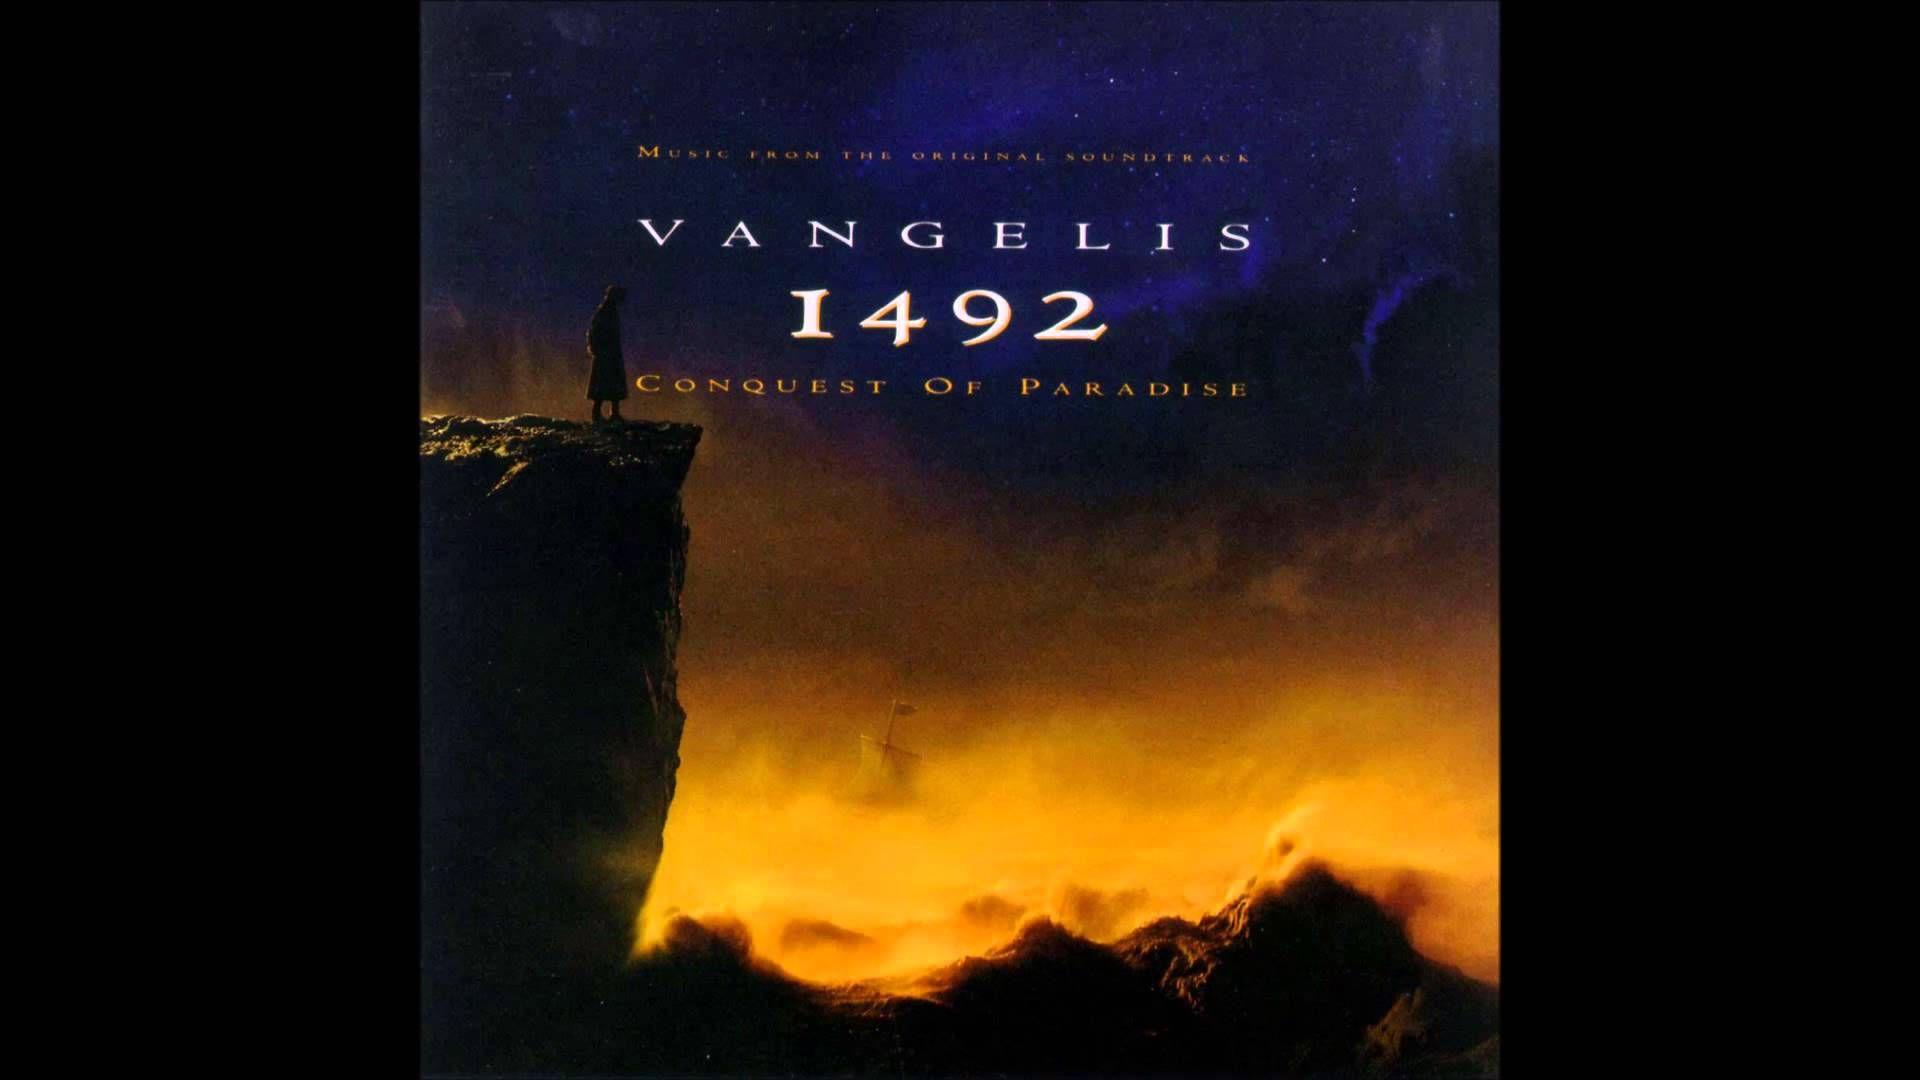 El Dulce Placer De Disfrutar La Buena Música Vangelis 1492 Conquest Of Paradise Full Album Conquest Of Paradise New Age Music Chill Out Music